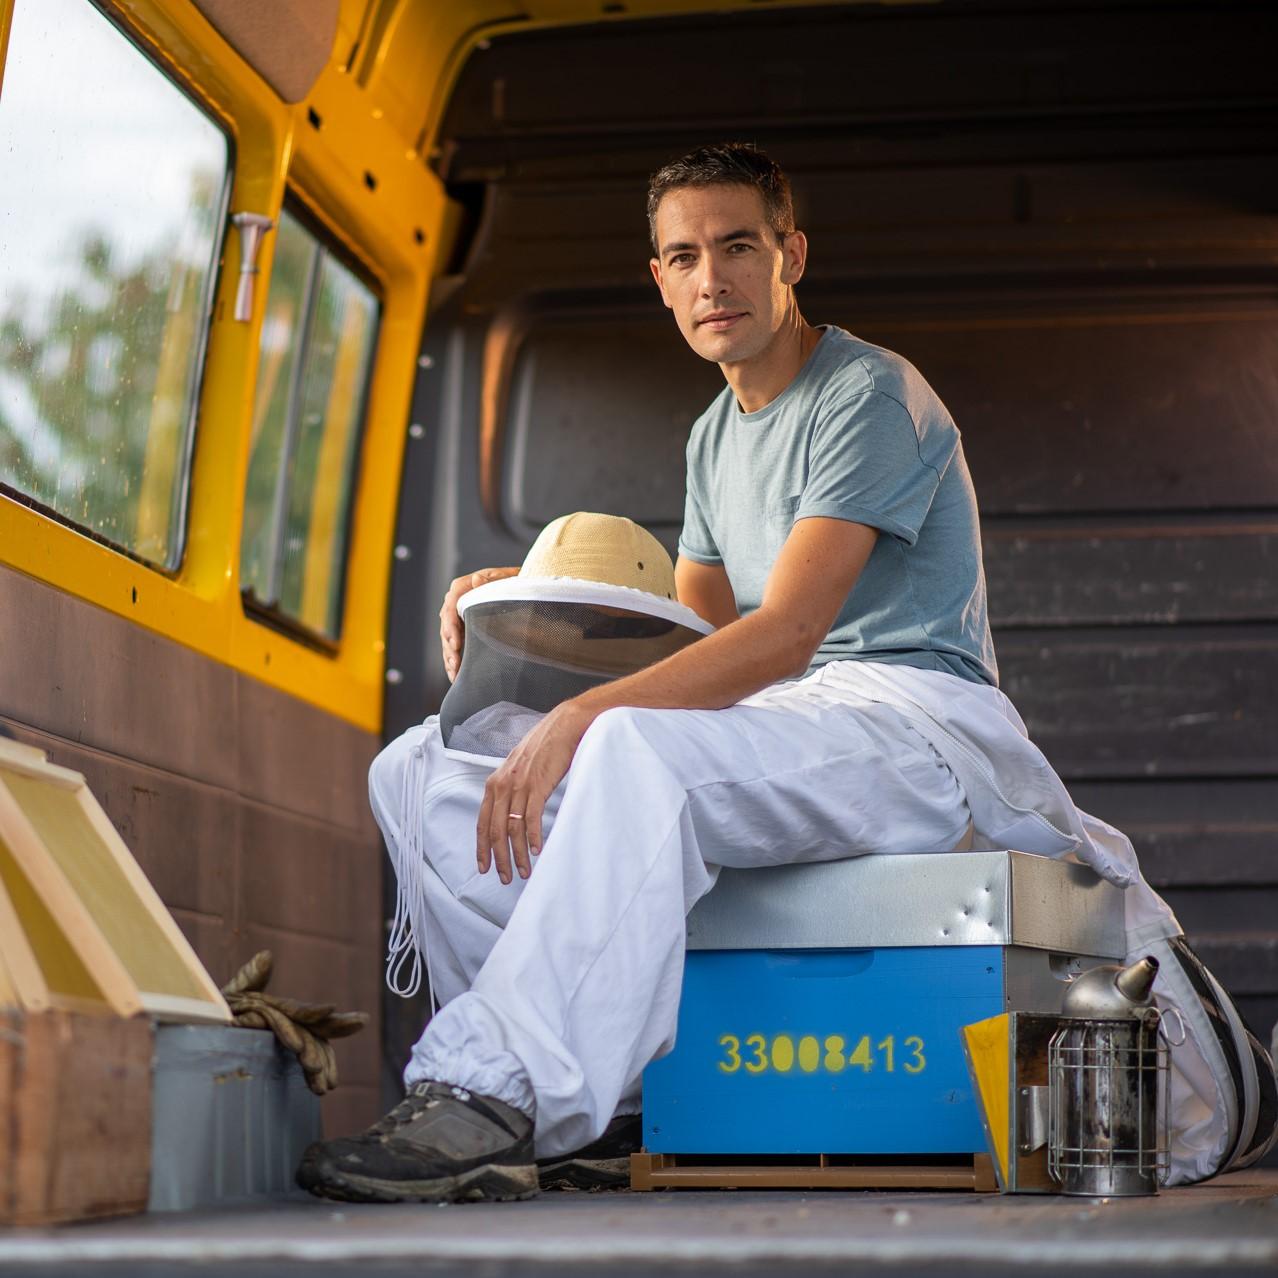 Juan l'apiculteur